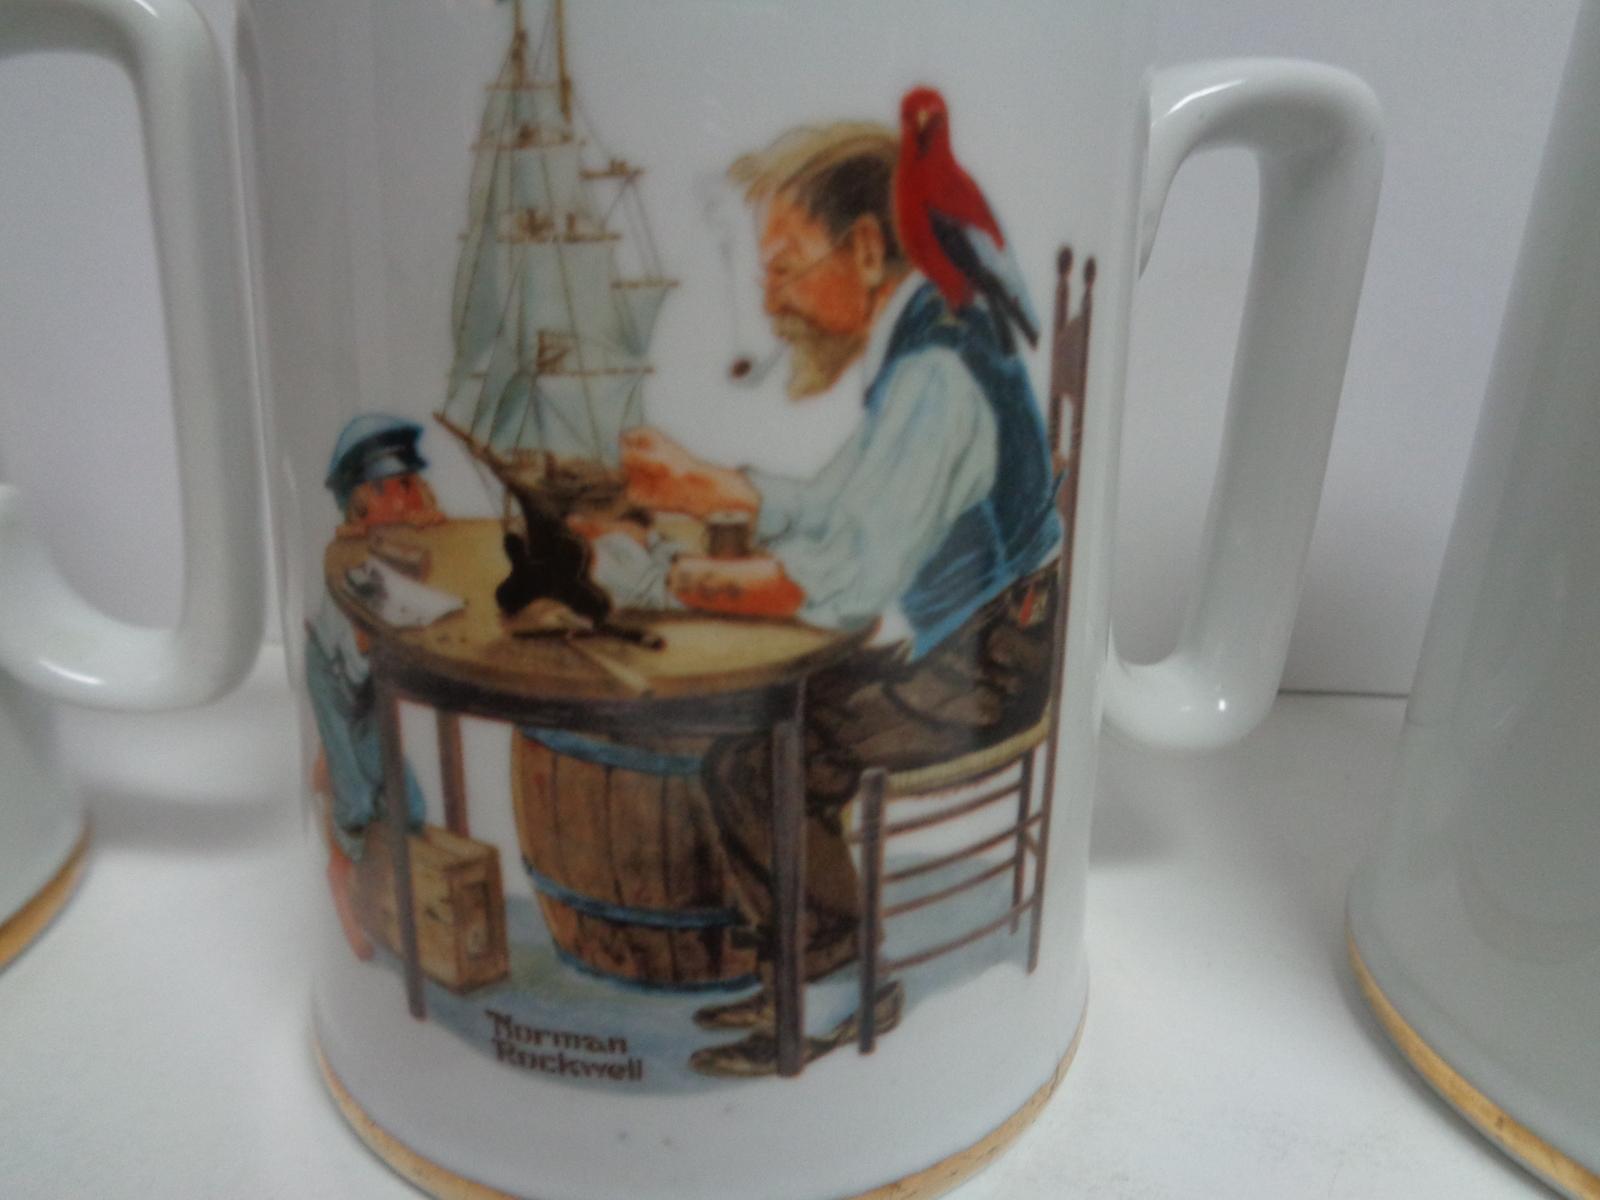 1985 Norman Rockwell Gold Trim Porcelain Decor Art Mugs Set of 3